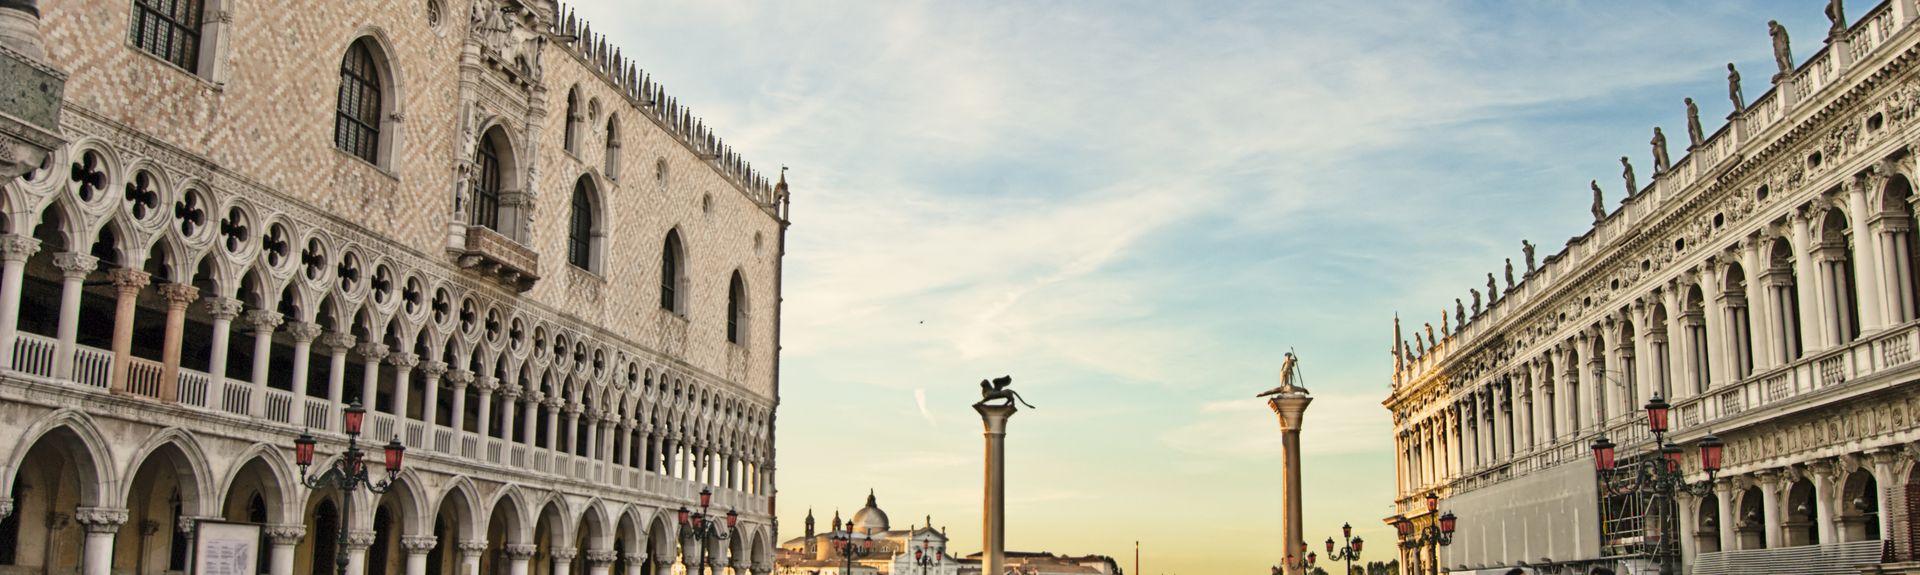 San Marco, Venice, Veneto, Italy